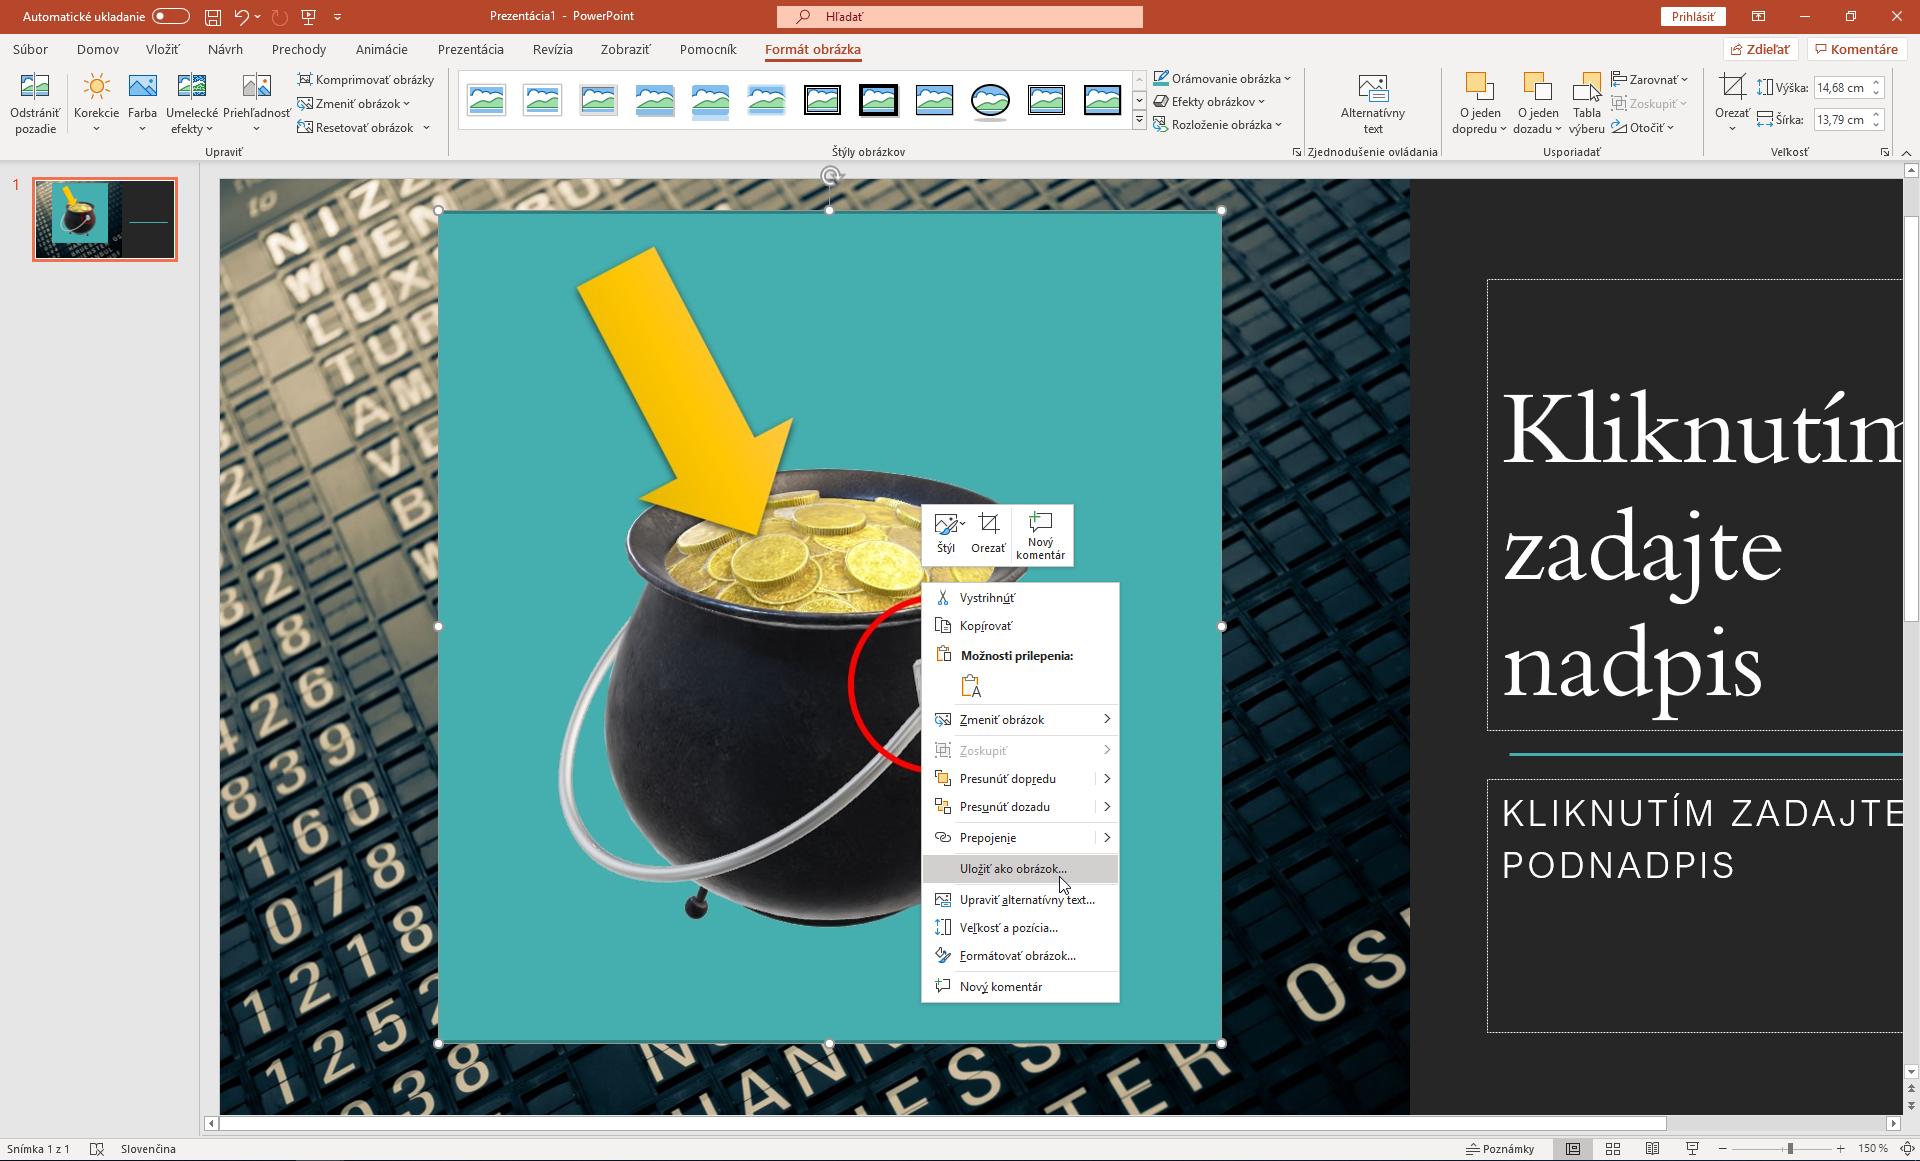 Ulozenie upraveneho obrazku je v PowerPointe jednoduche